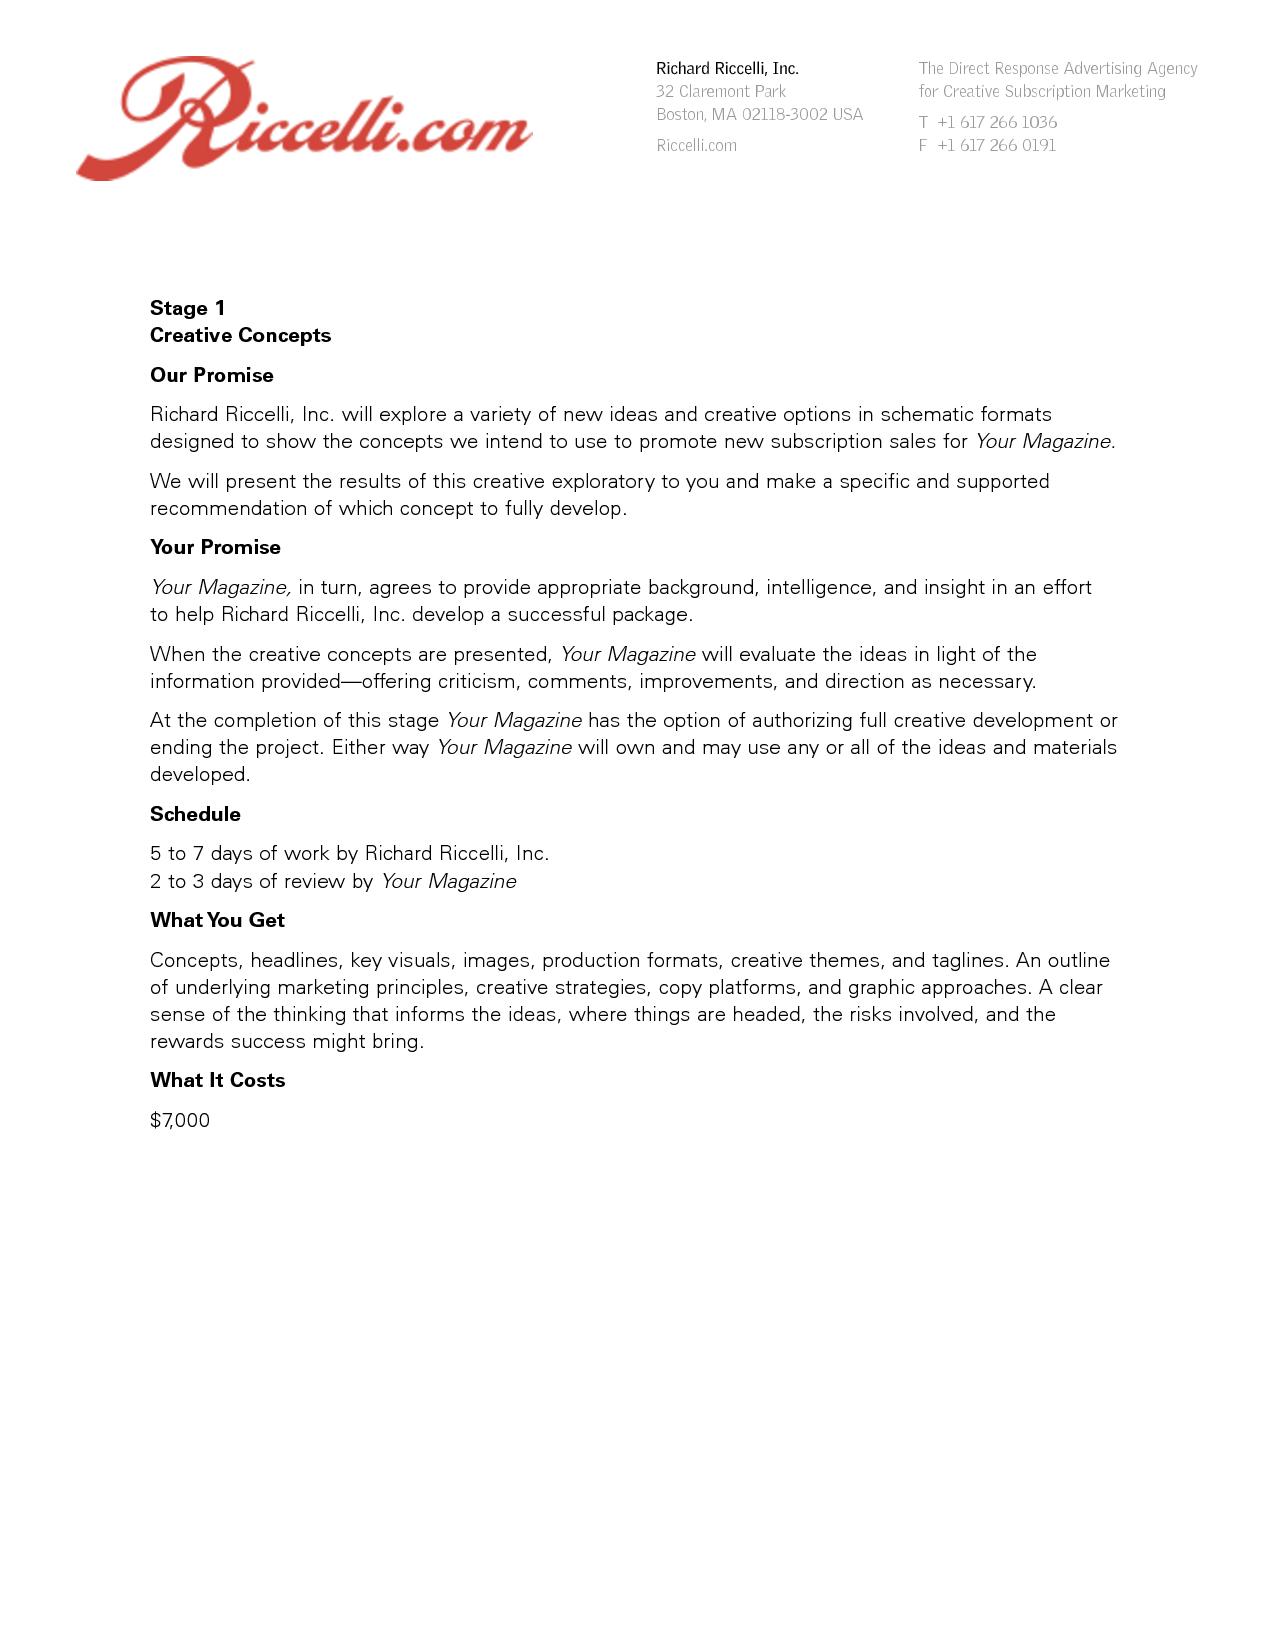 Proposal Letter  Advertising Proposals    Proposal